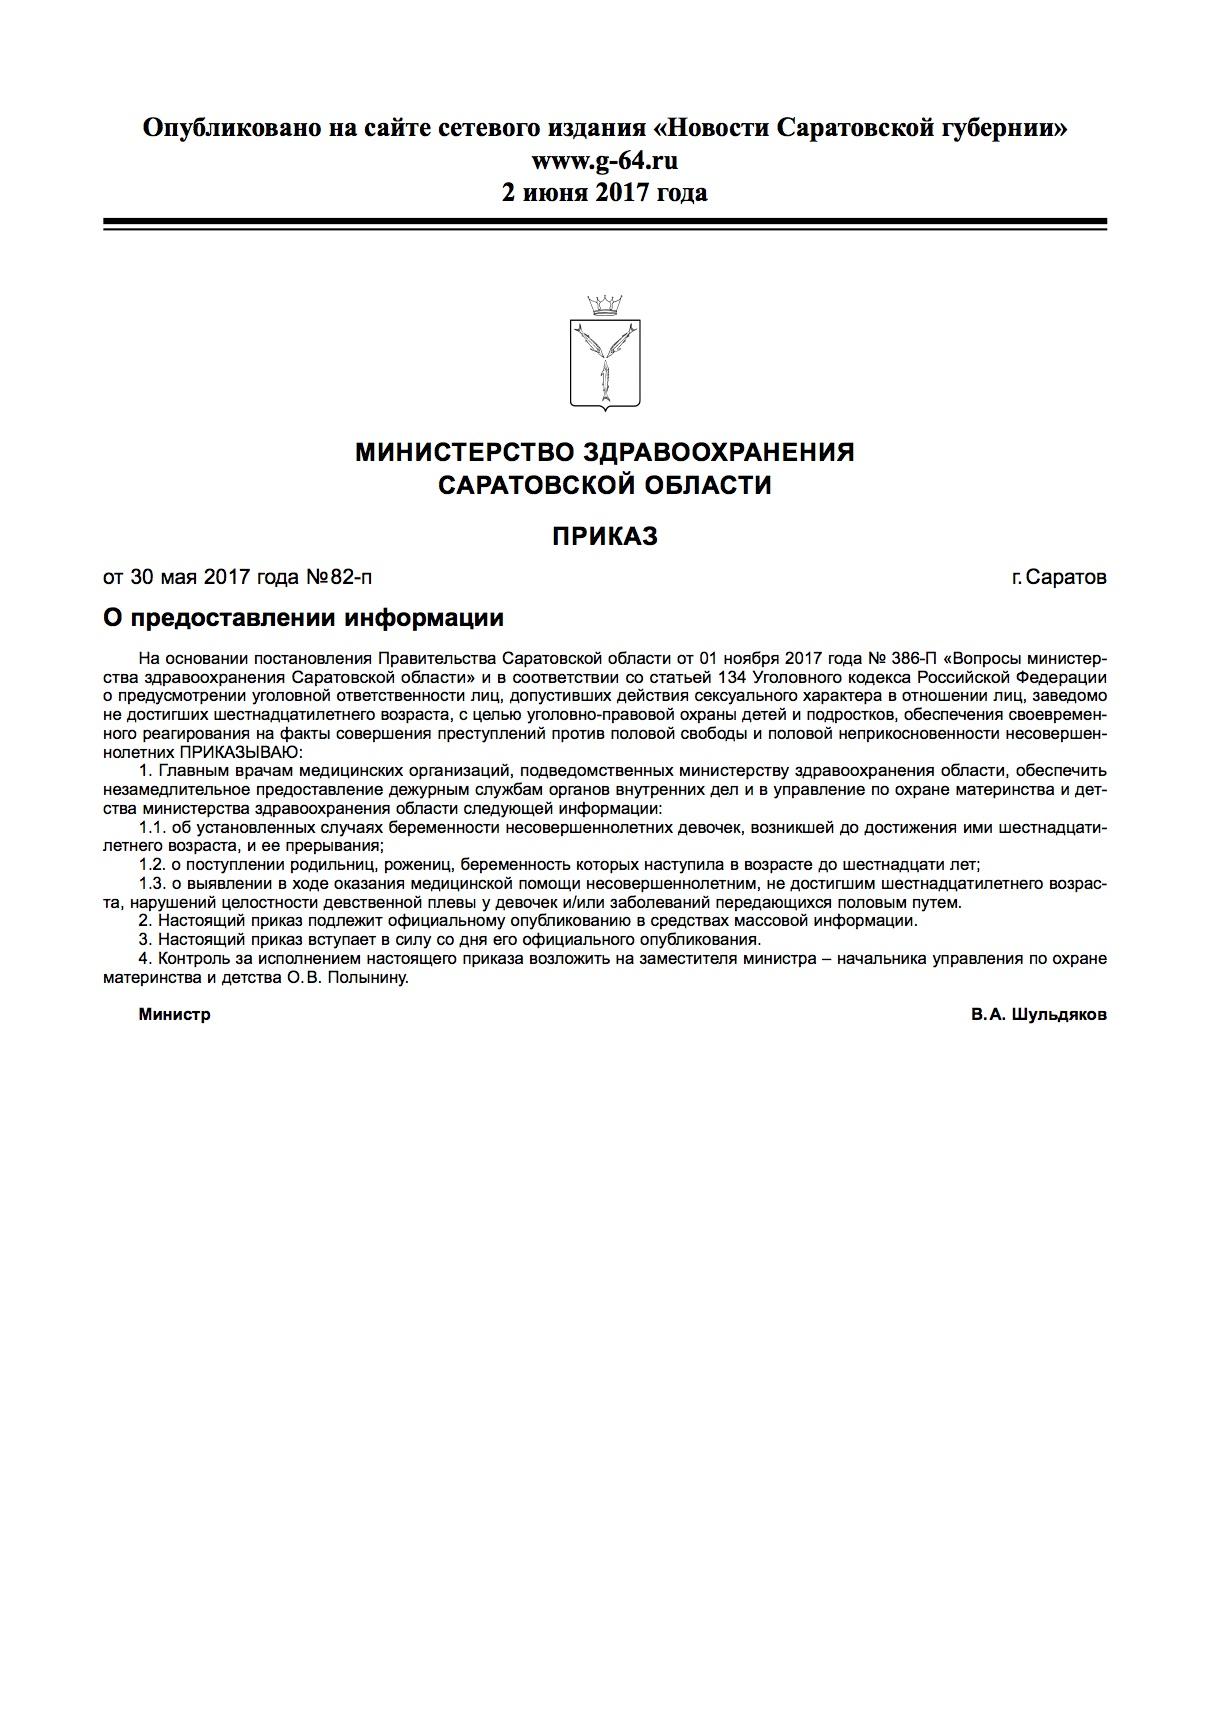 Приказ В.Шульдякова от 30 мая 2017.jpg